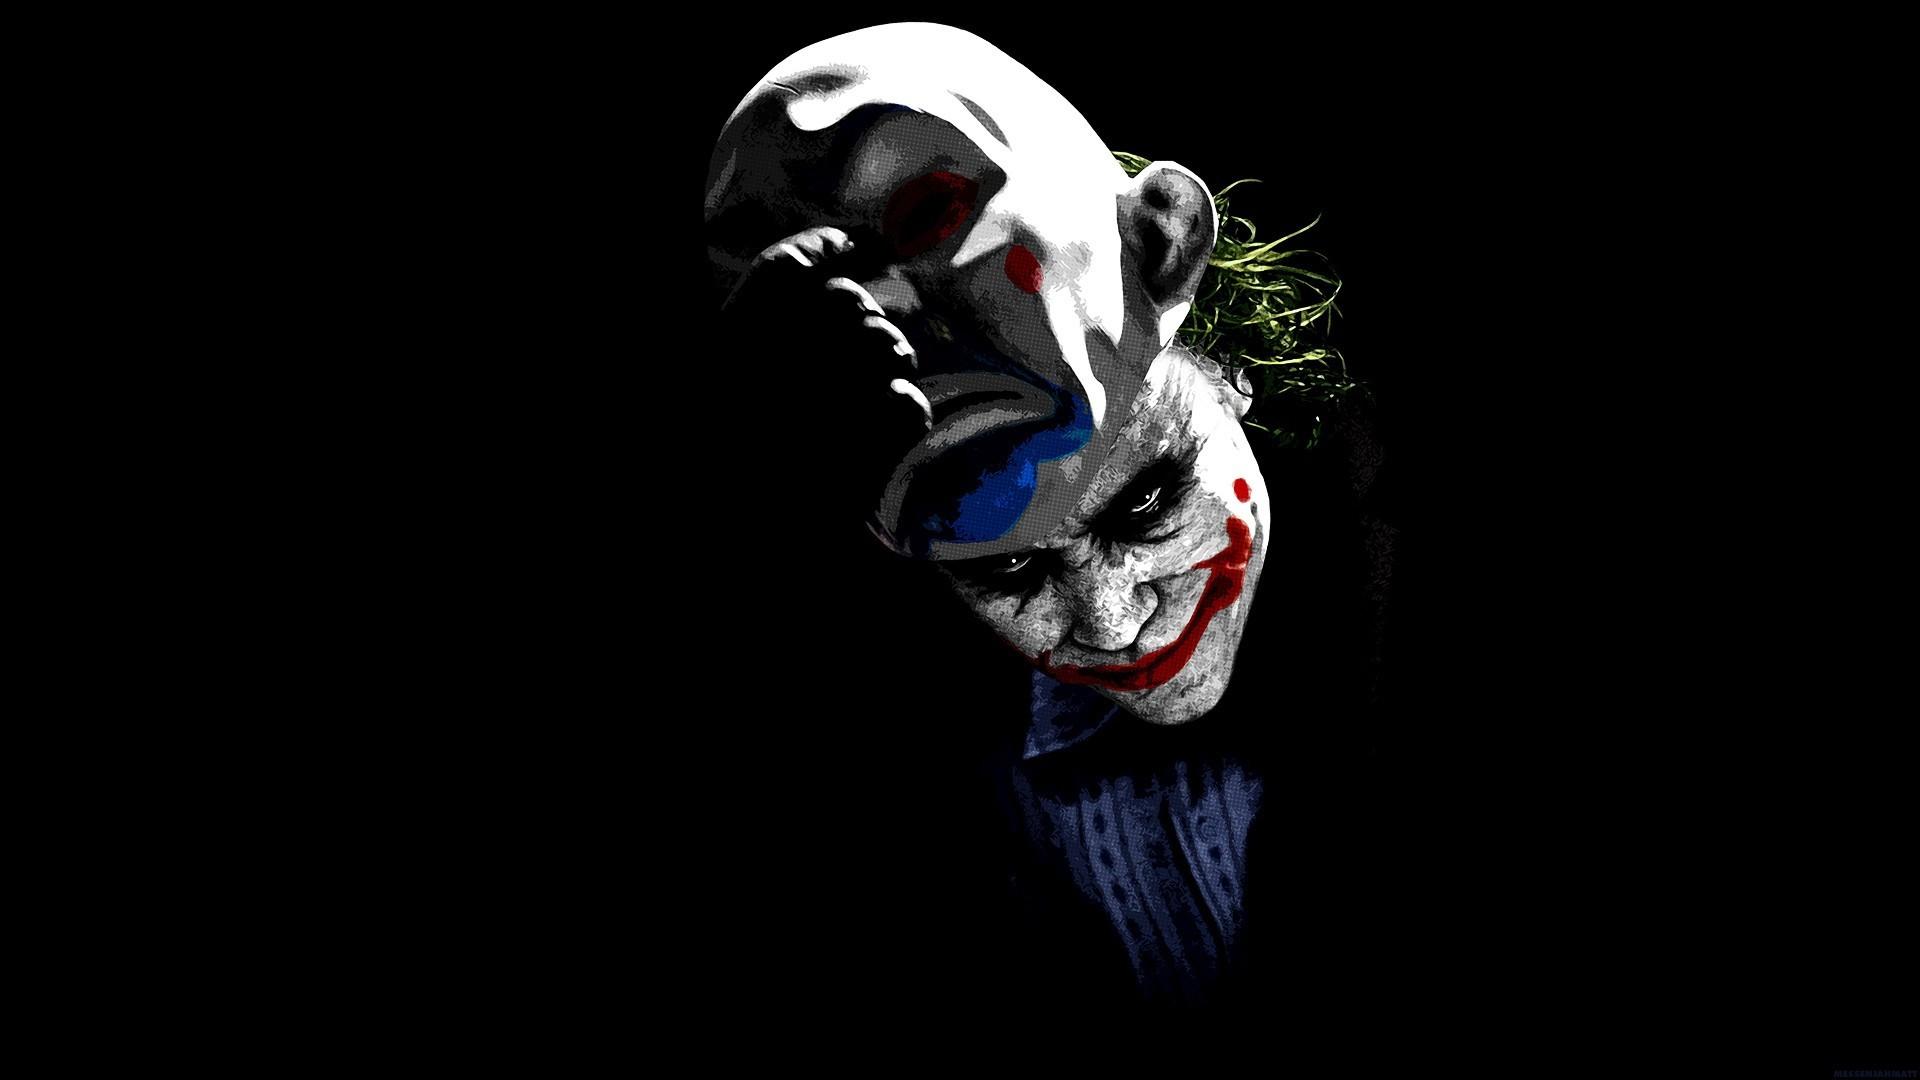 General-1920x1080-Joker-Batman-The-Dark-Knight-wallpaper-wp3606113